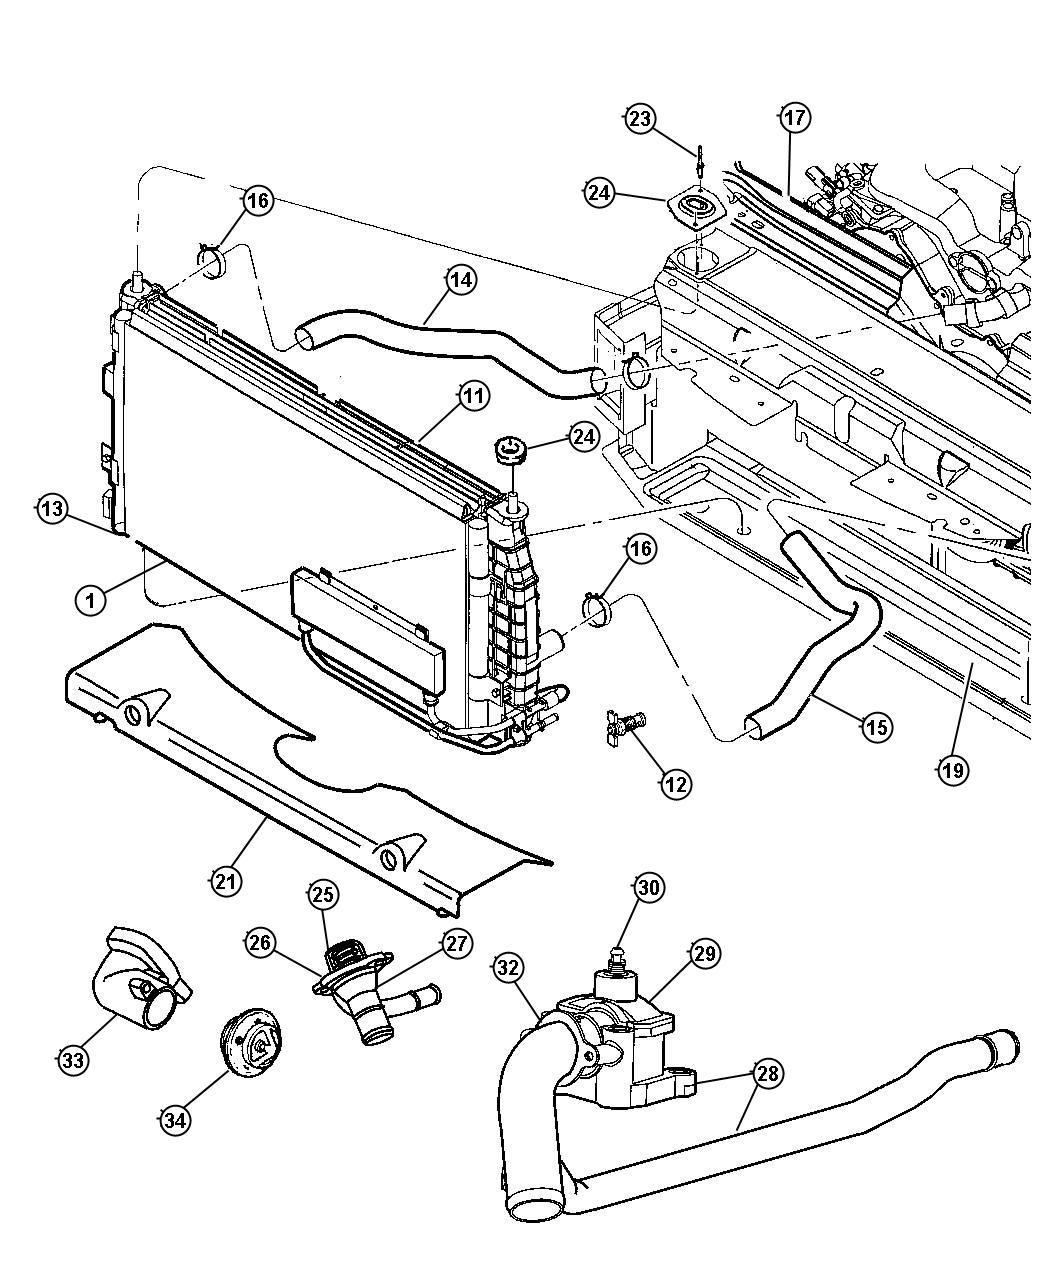 Chrysler Concorde Radiator Replacement